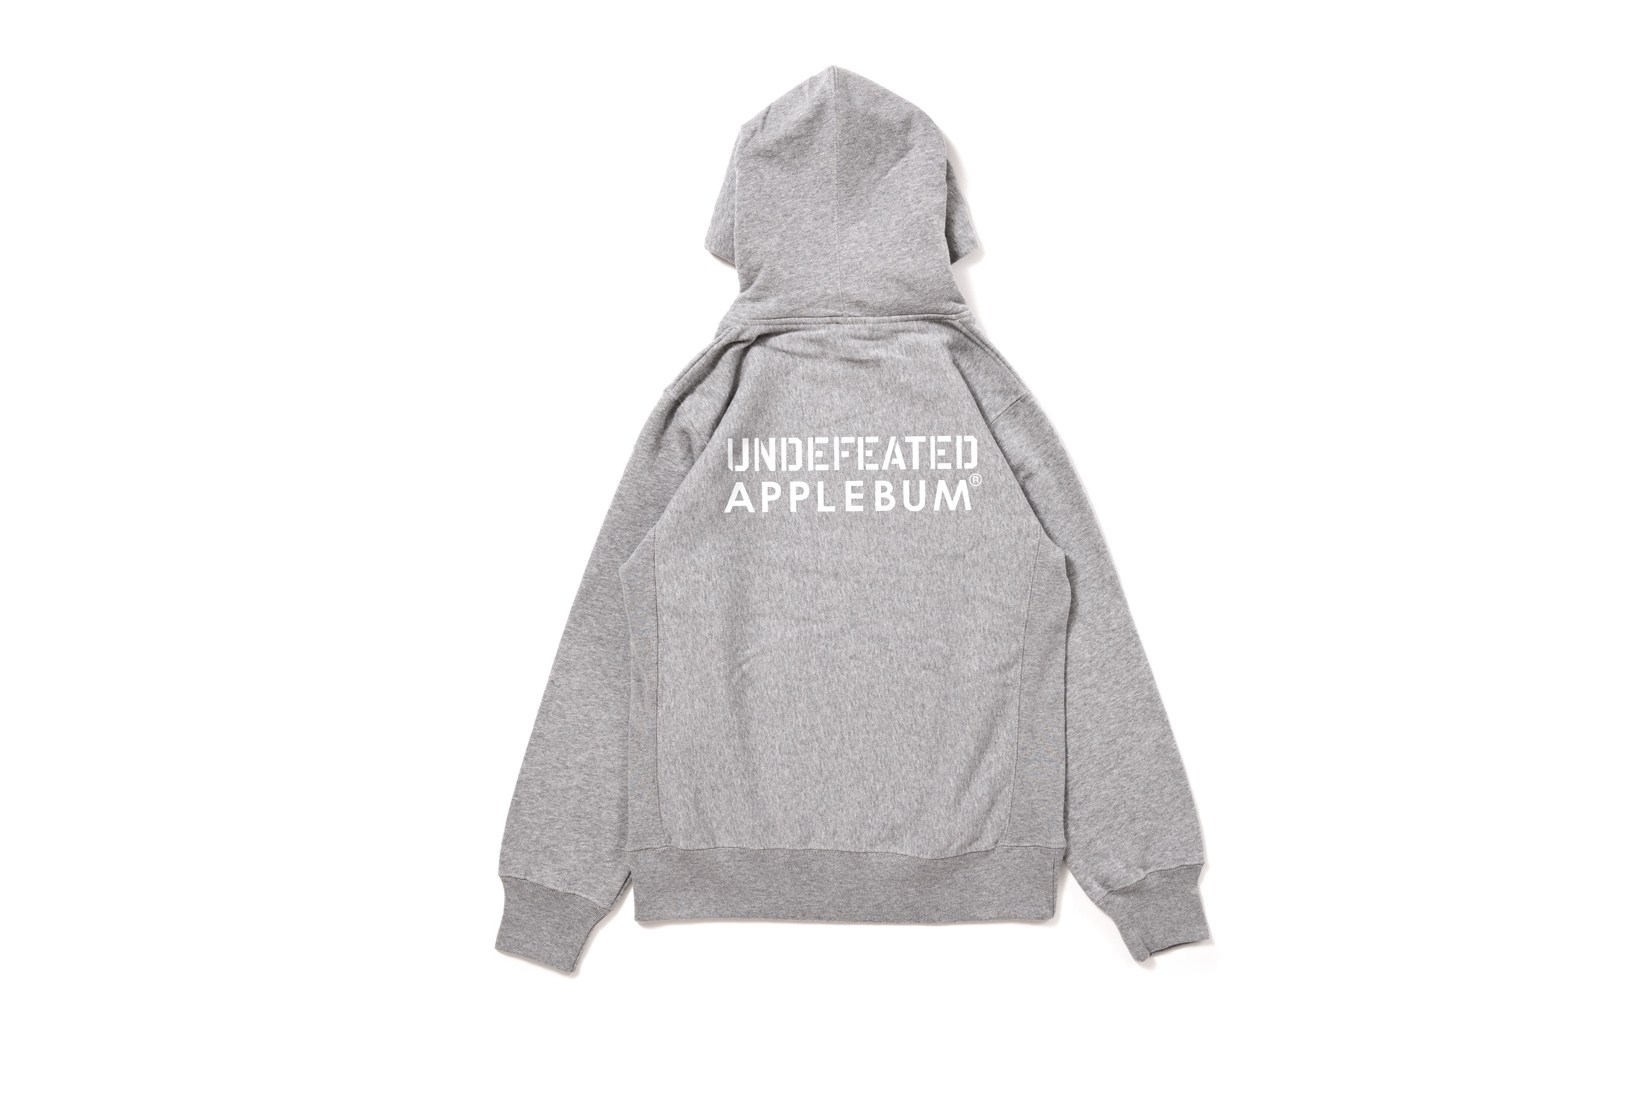 undefeated-applebum-2016-5